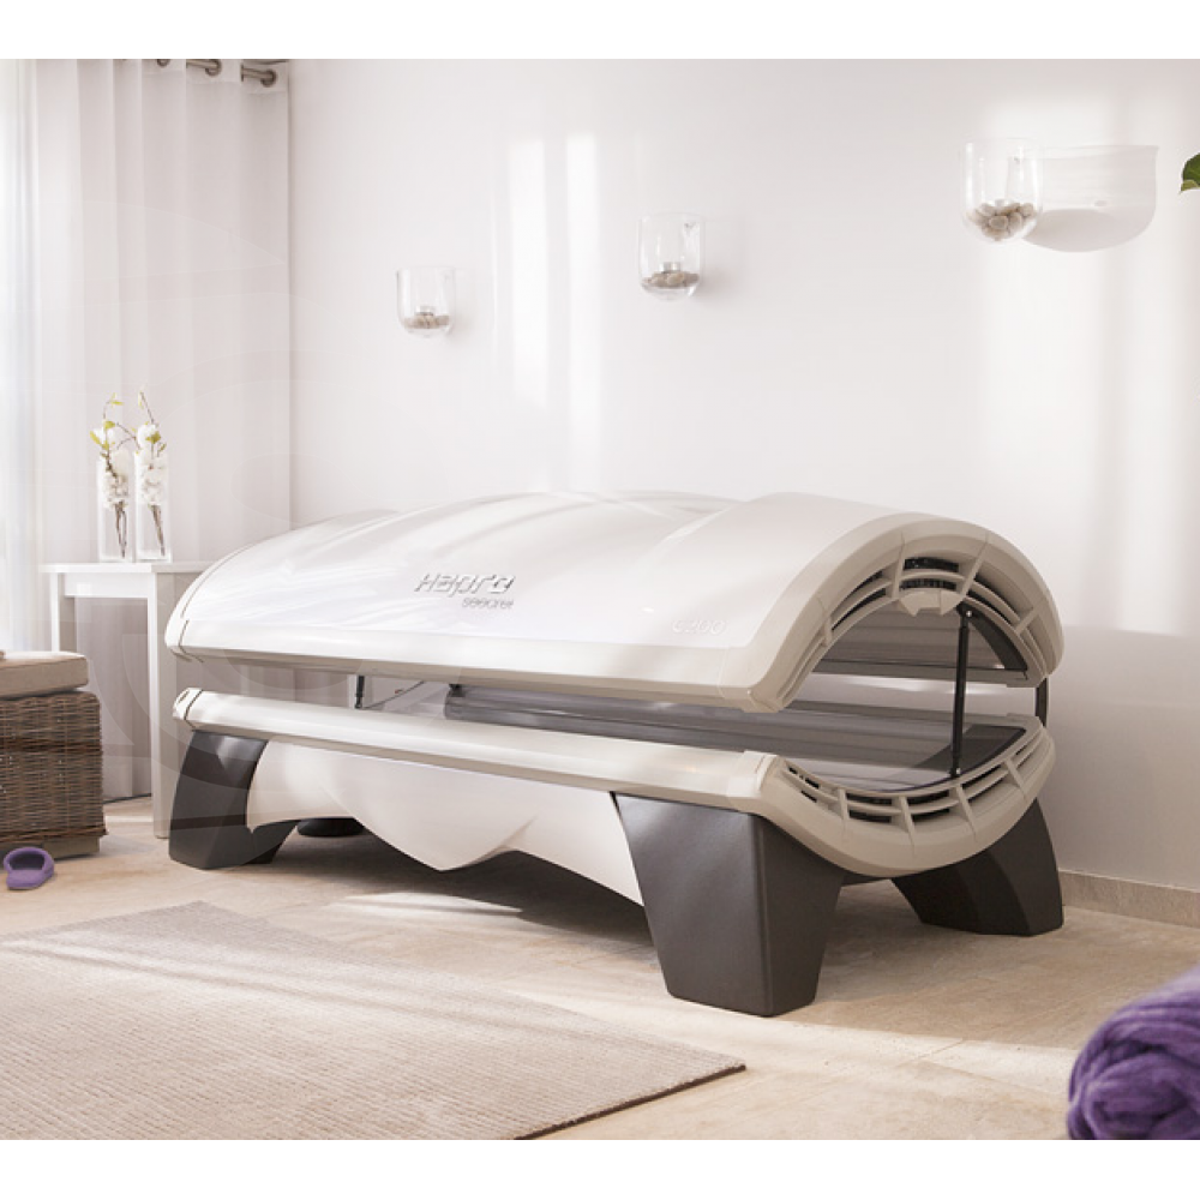 Hapro Proline 28/1 C White Pearl - Solarium horizontal - Home Tanning - Hapro